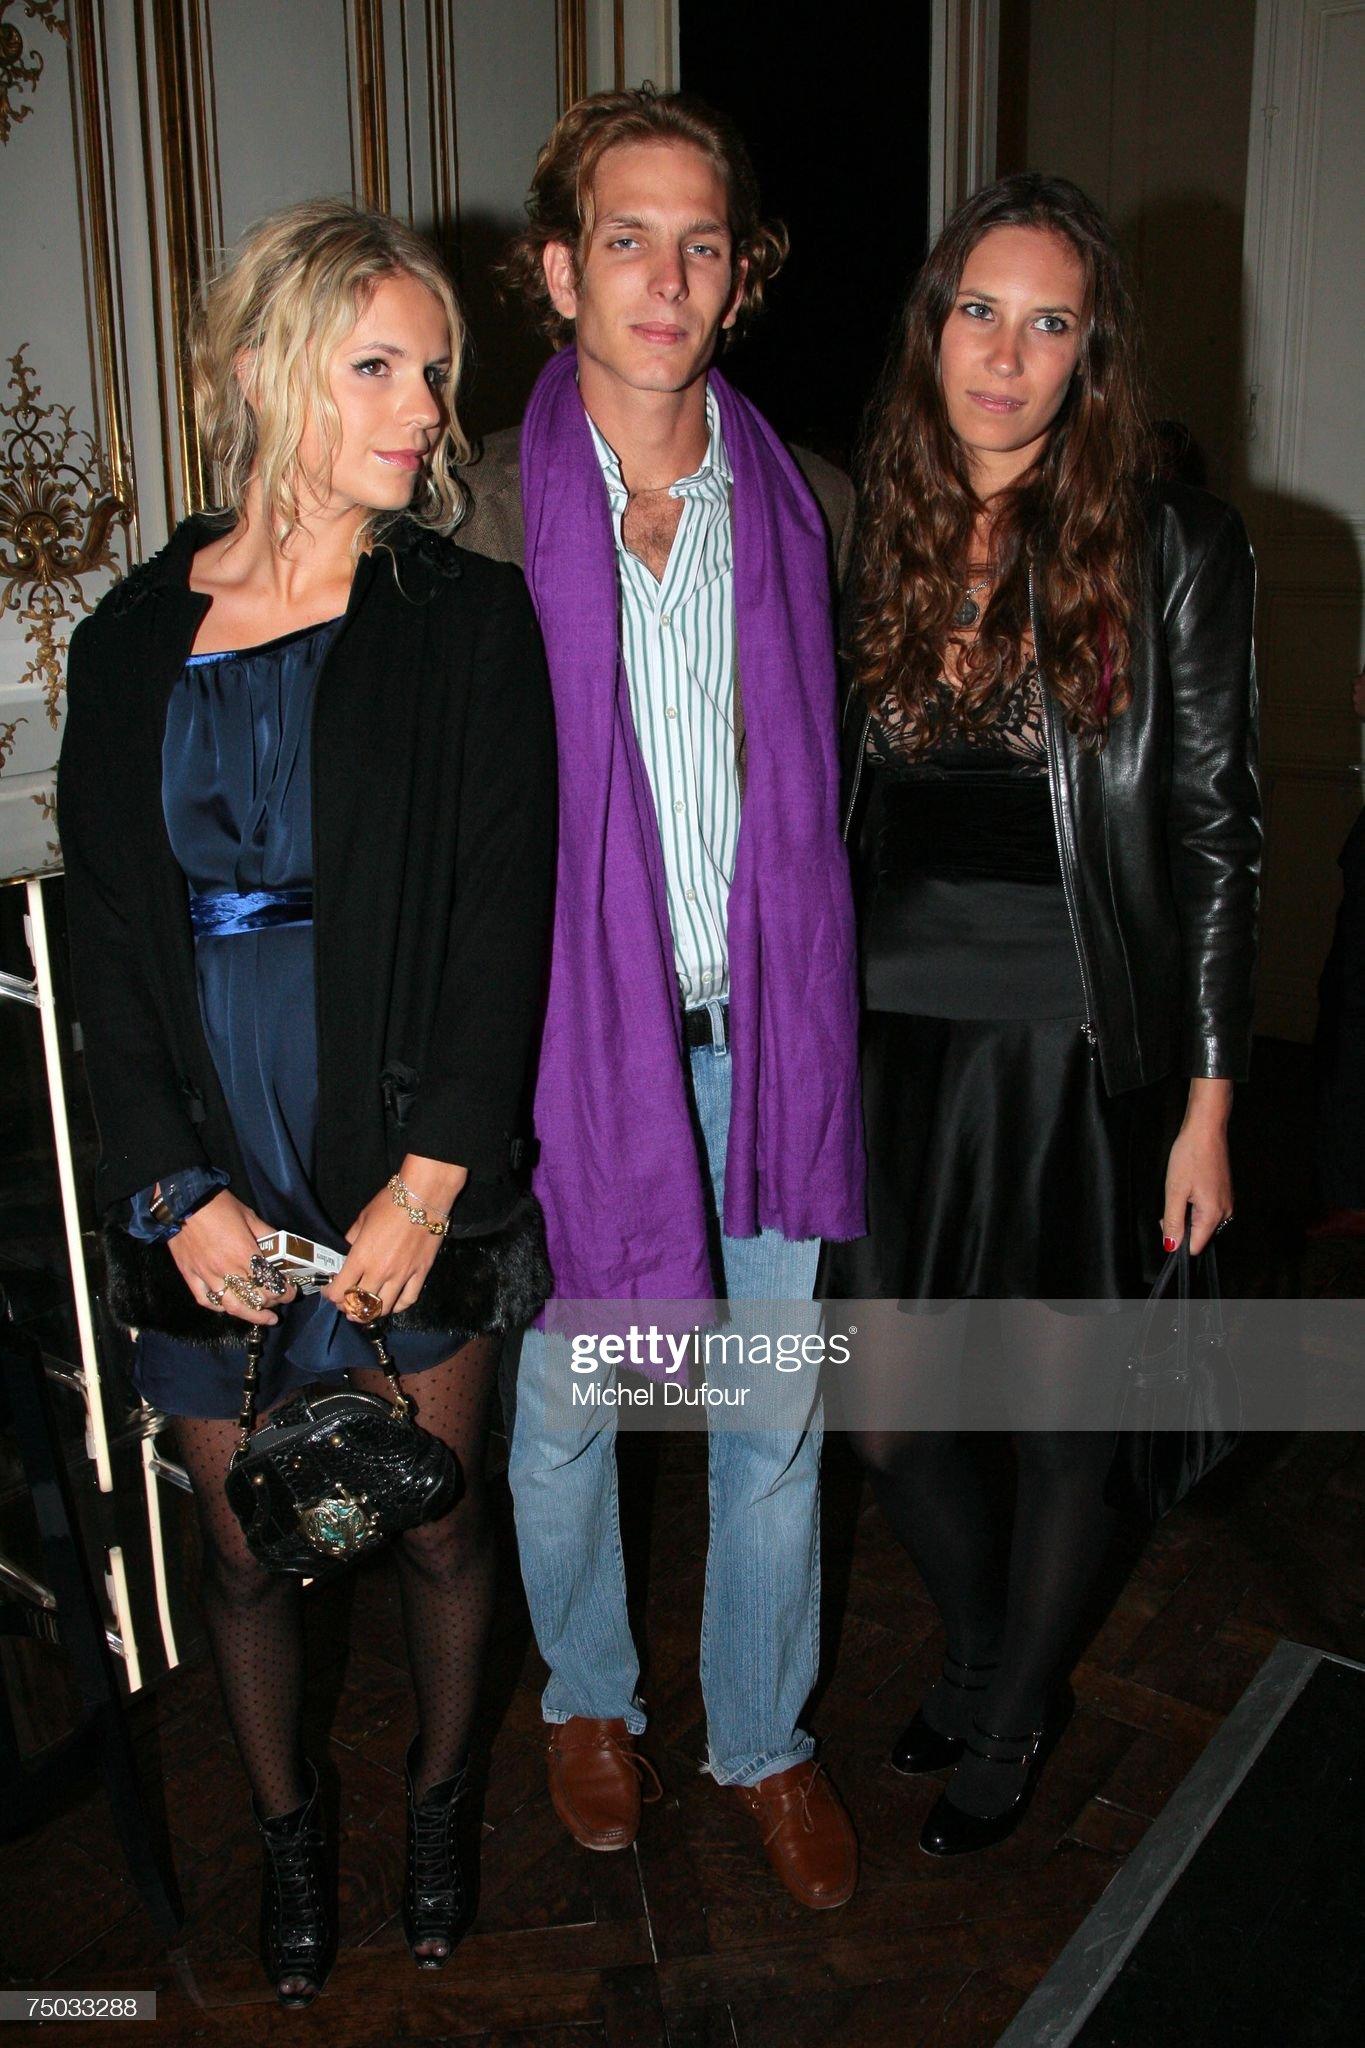 Dom Perignon - Karl Lagerfeld Party : News Photo